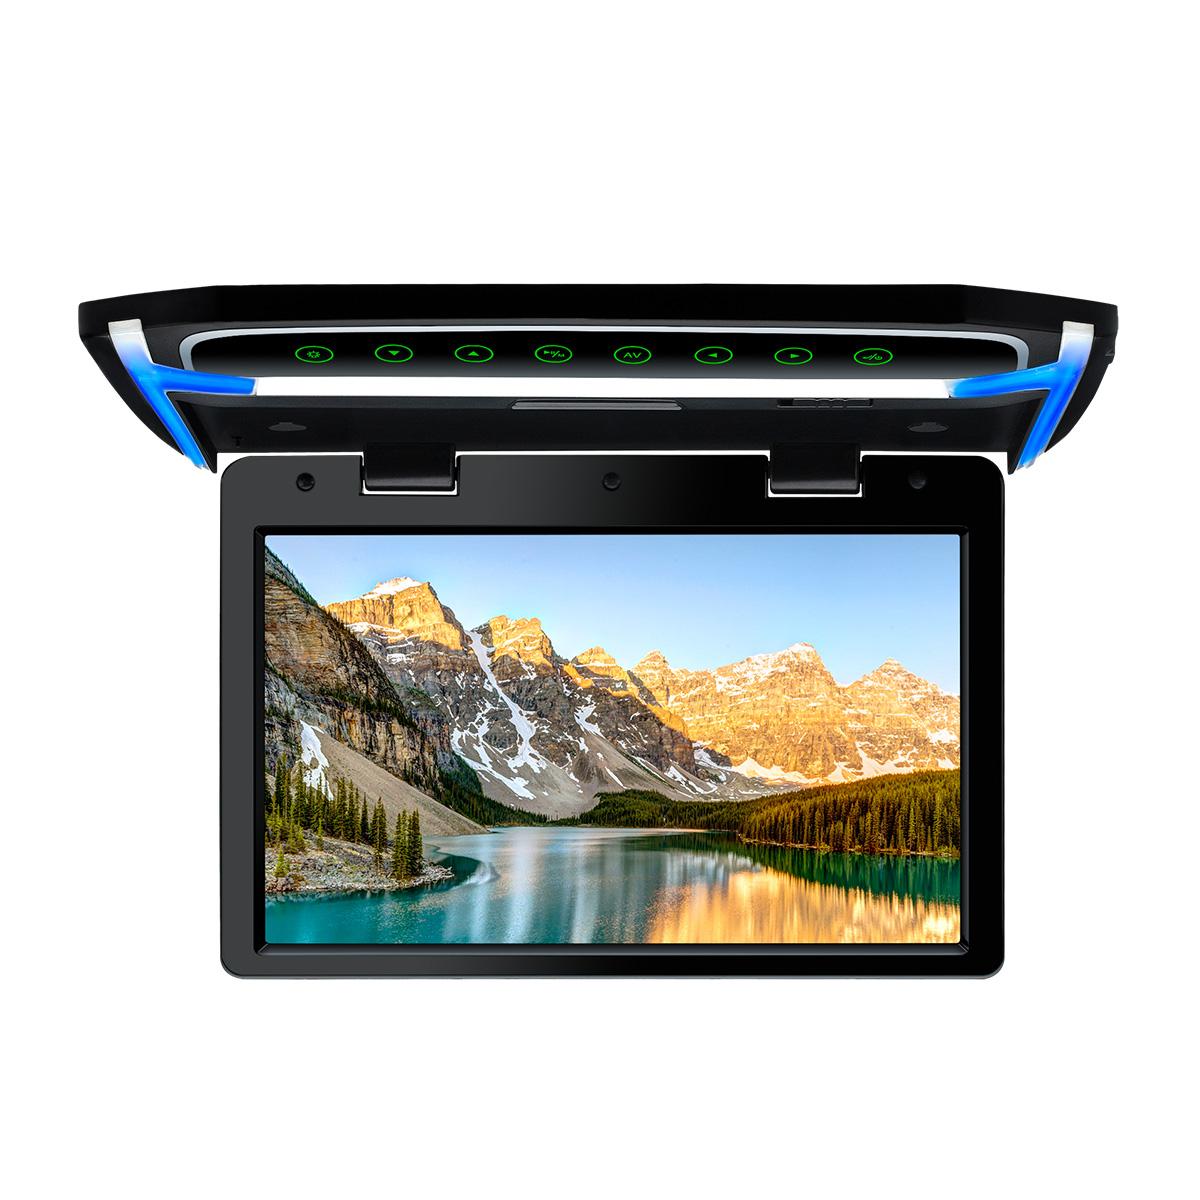 (CM101HD)XTRONS 最新 10.2インチ フリップダウンモニター 1024x600 解像度 超薄 HDMI対応 1080Pビデオ対応 MP5対応 外部入力 ドア連動 水平開閉180度 USB・SD